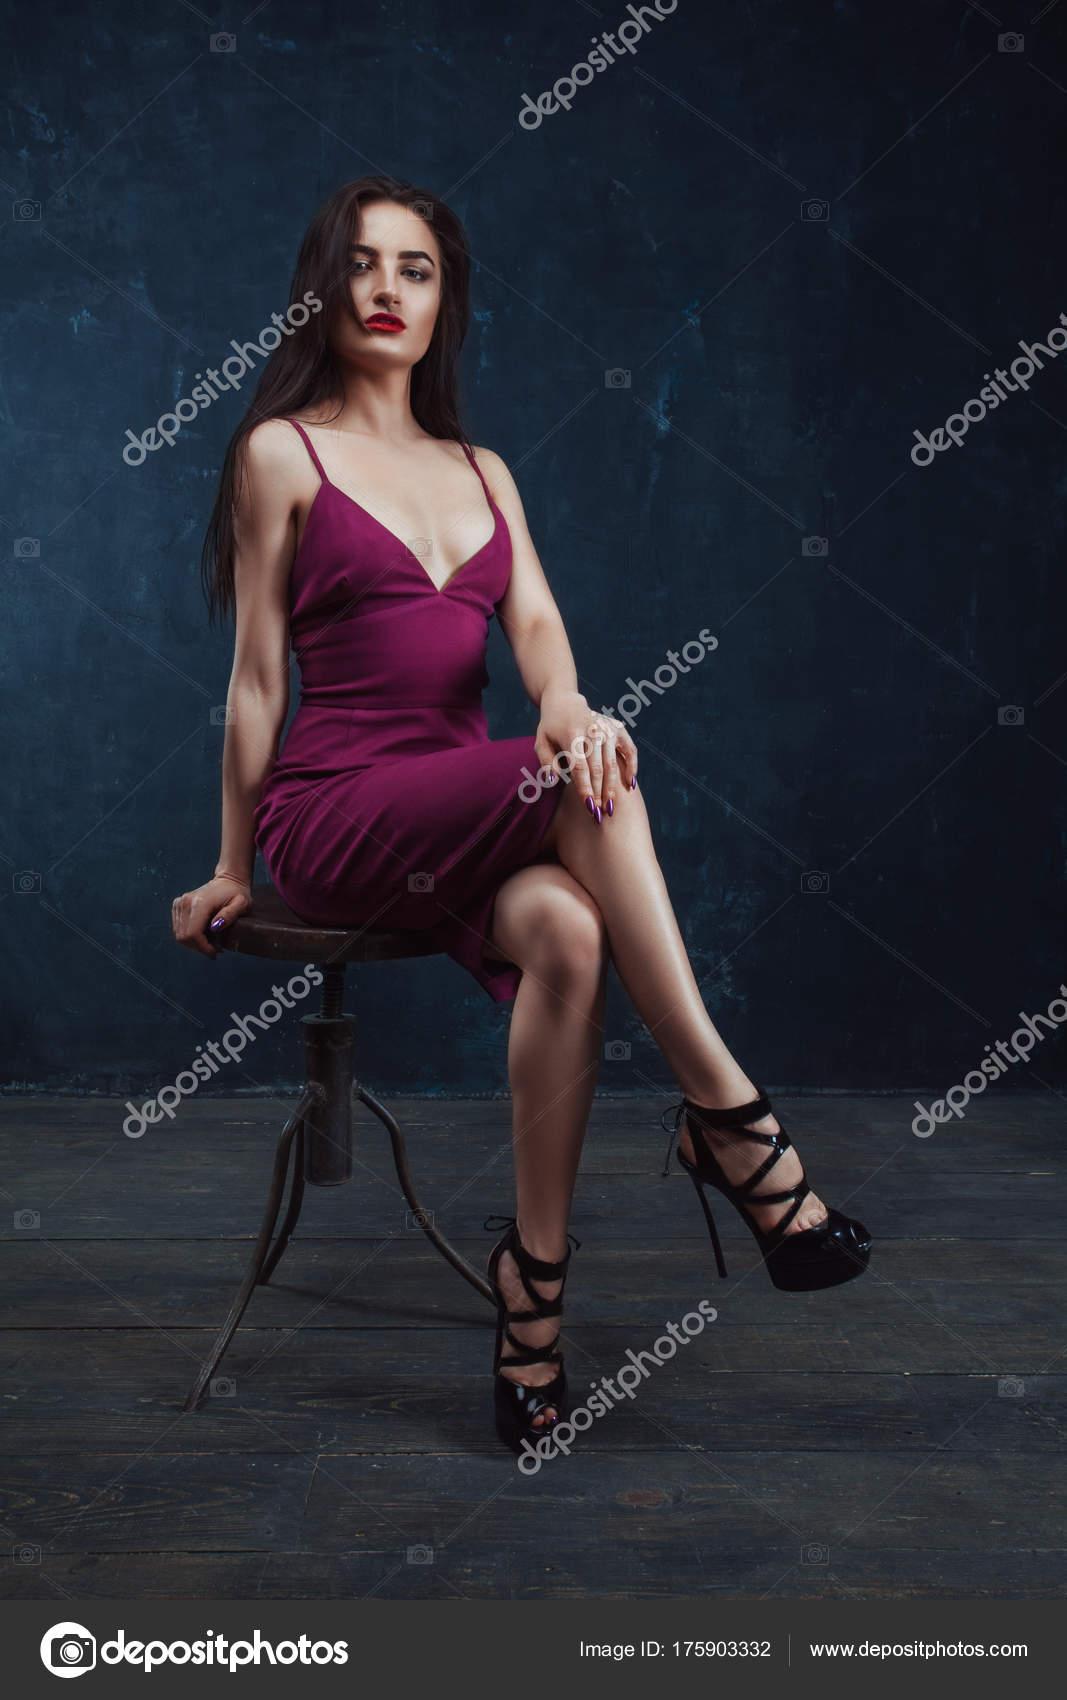 Vestido blanco vestido rojo antifaz